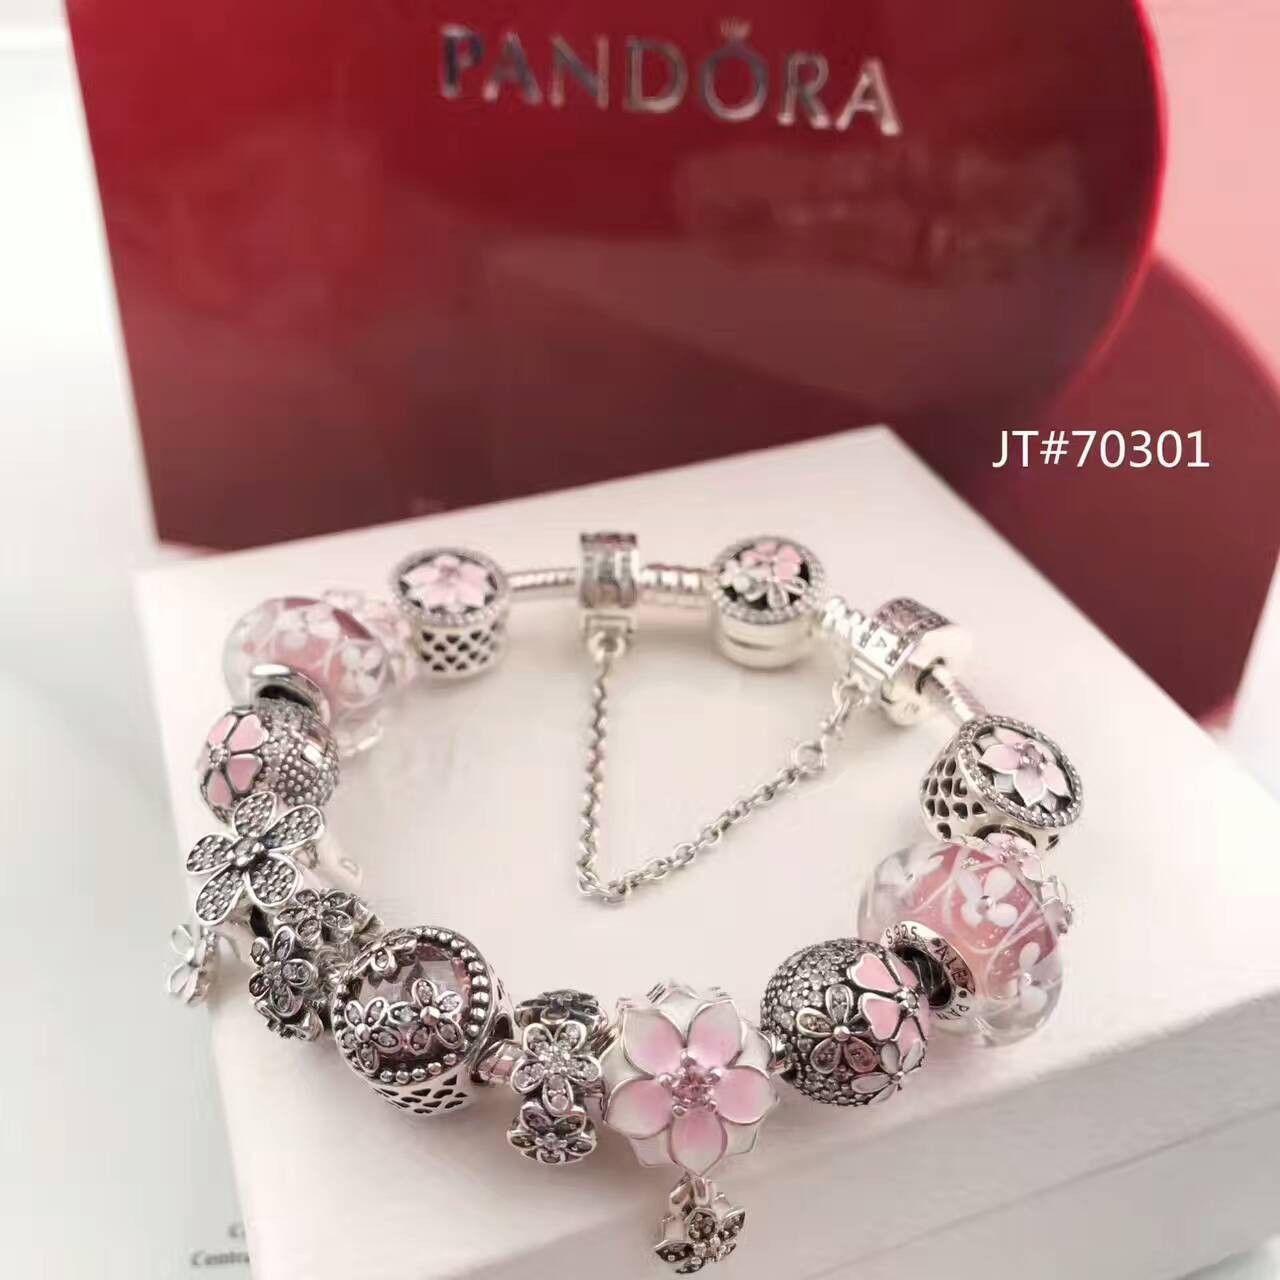 42092ddf8 pandora charm bracelet with poetic blooms clasp flower theme $225 ...